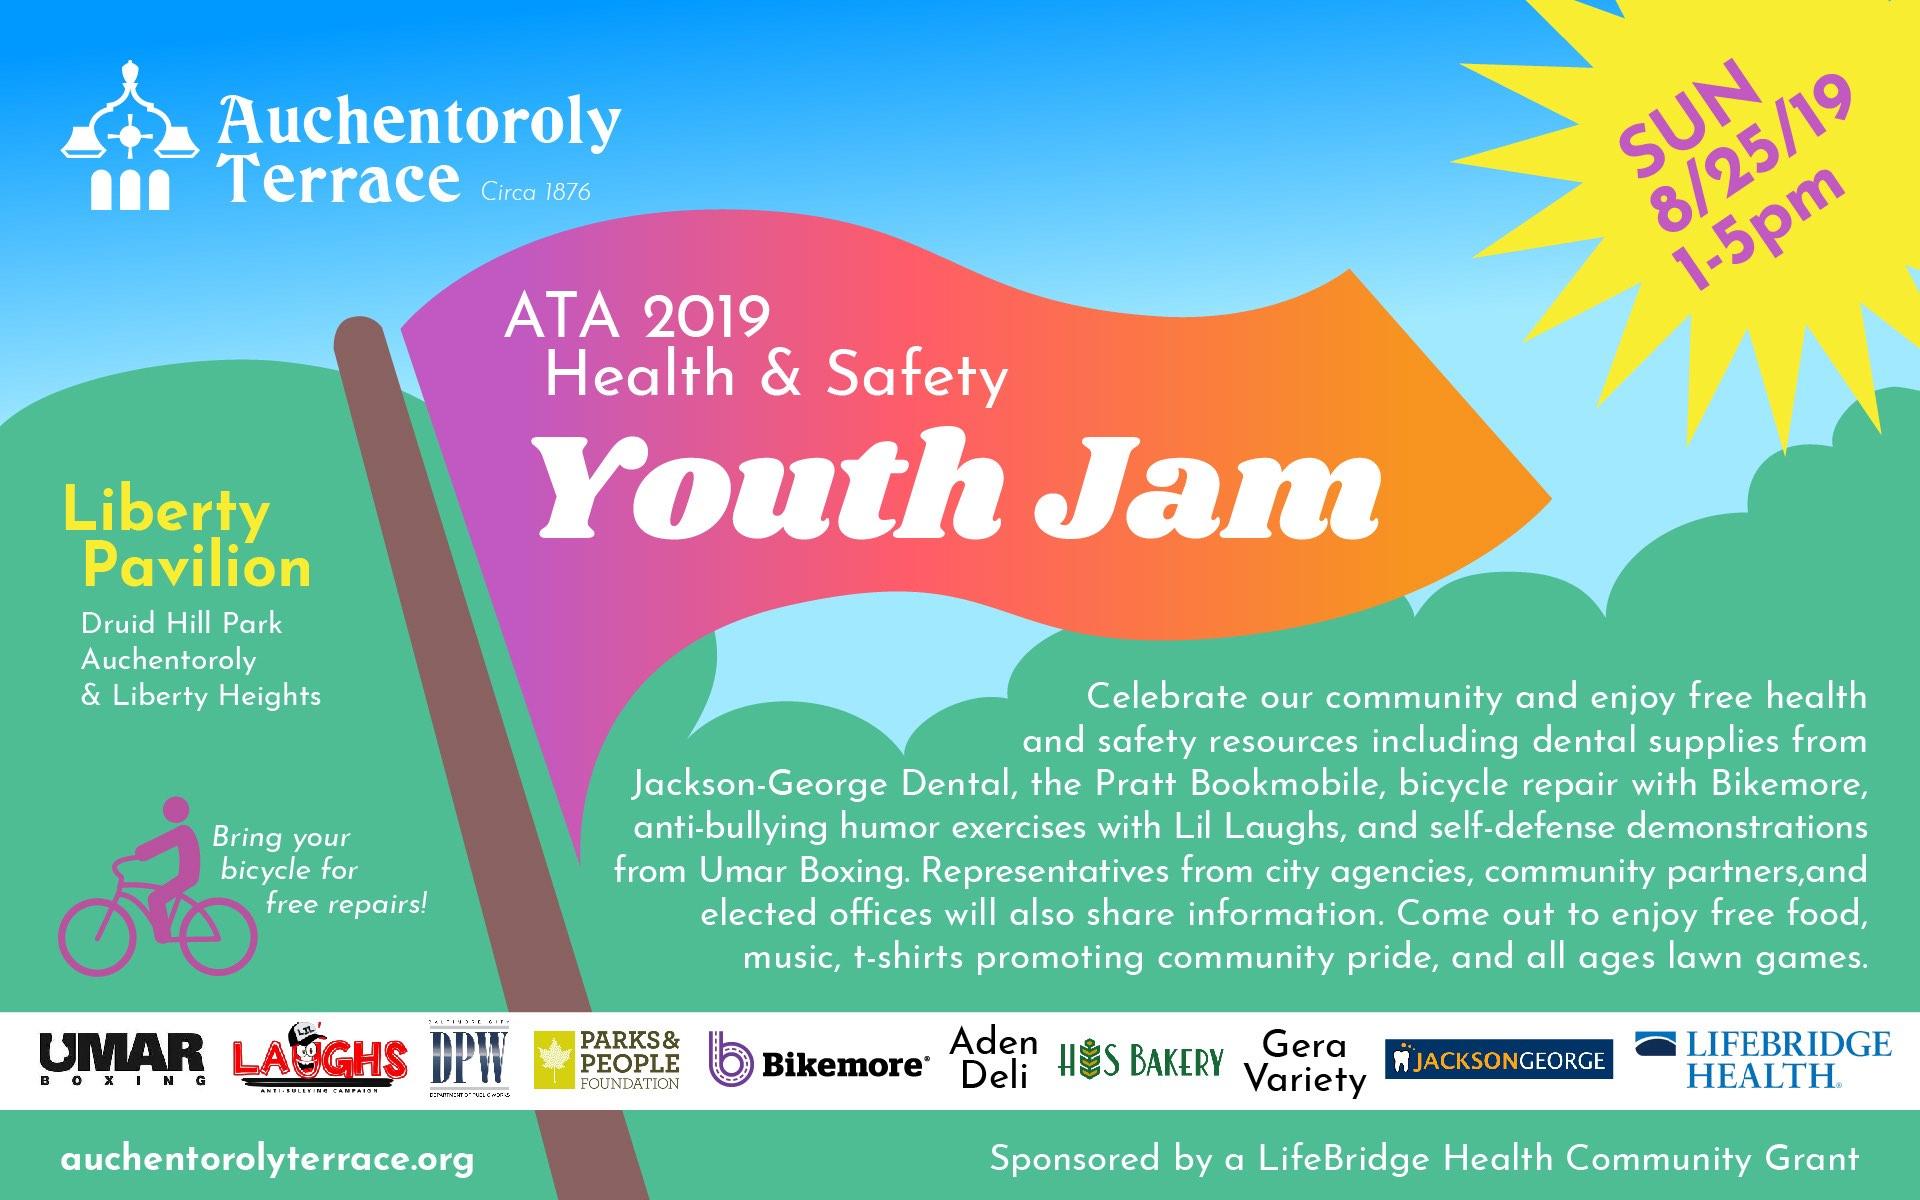 ATA 2019 Youth Jam 8.25.19 flyer.jpg